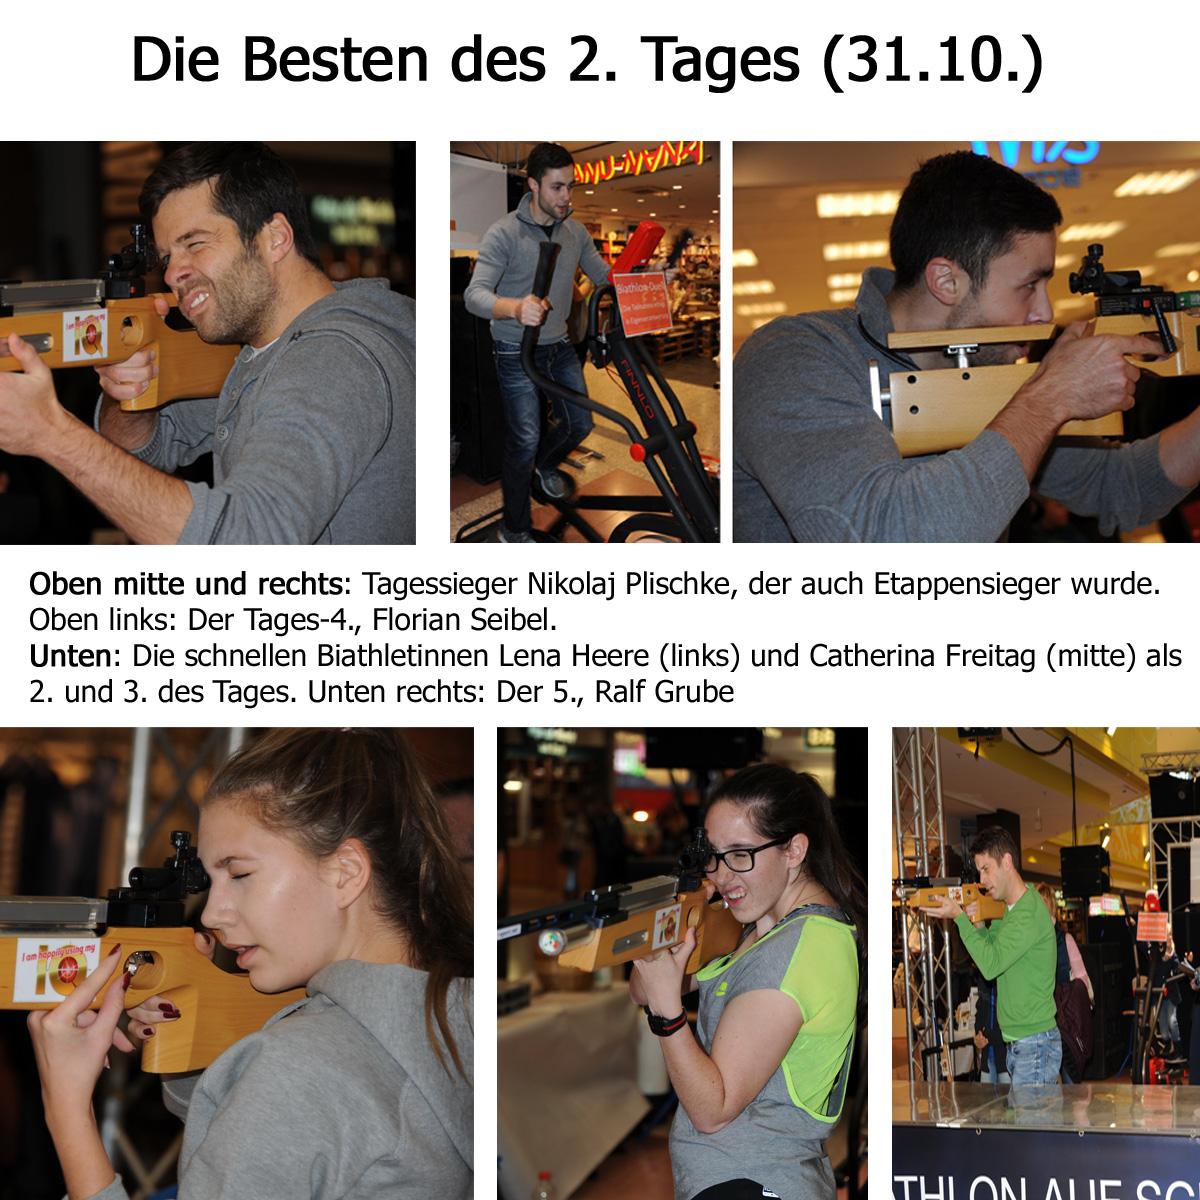 Die_Besten_2er_Tag_web